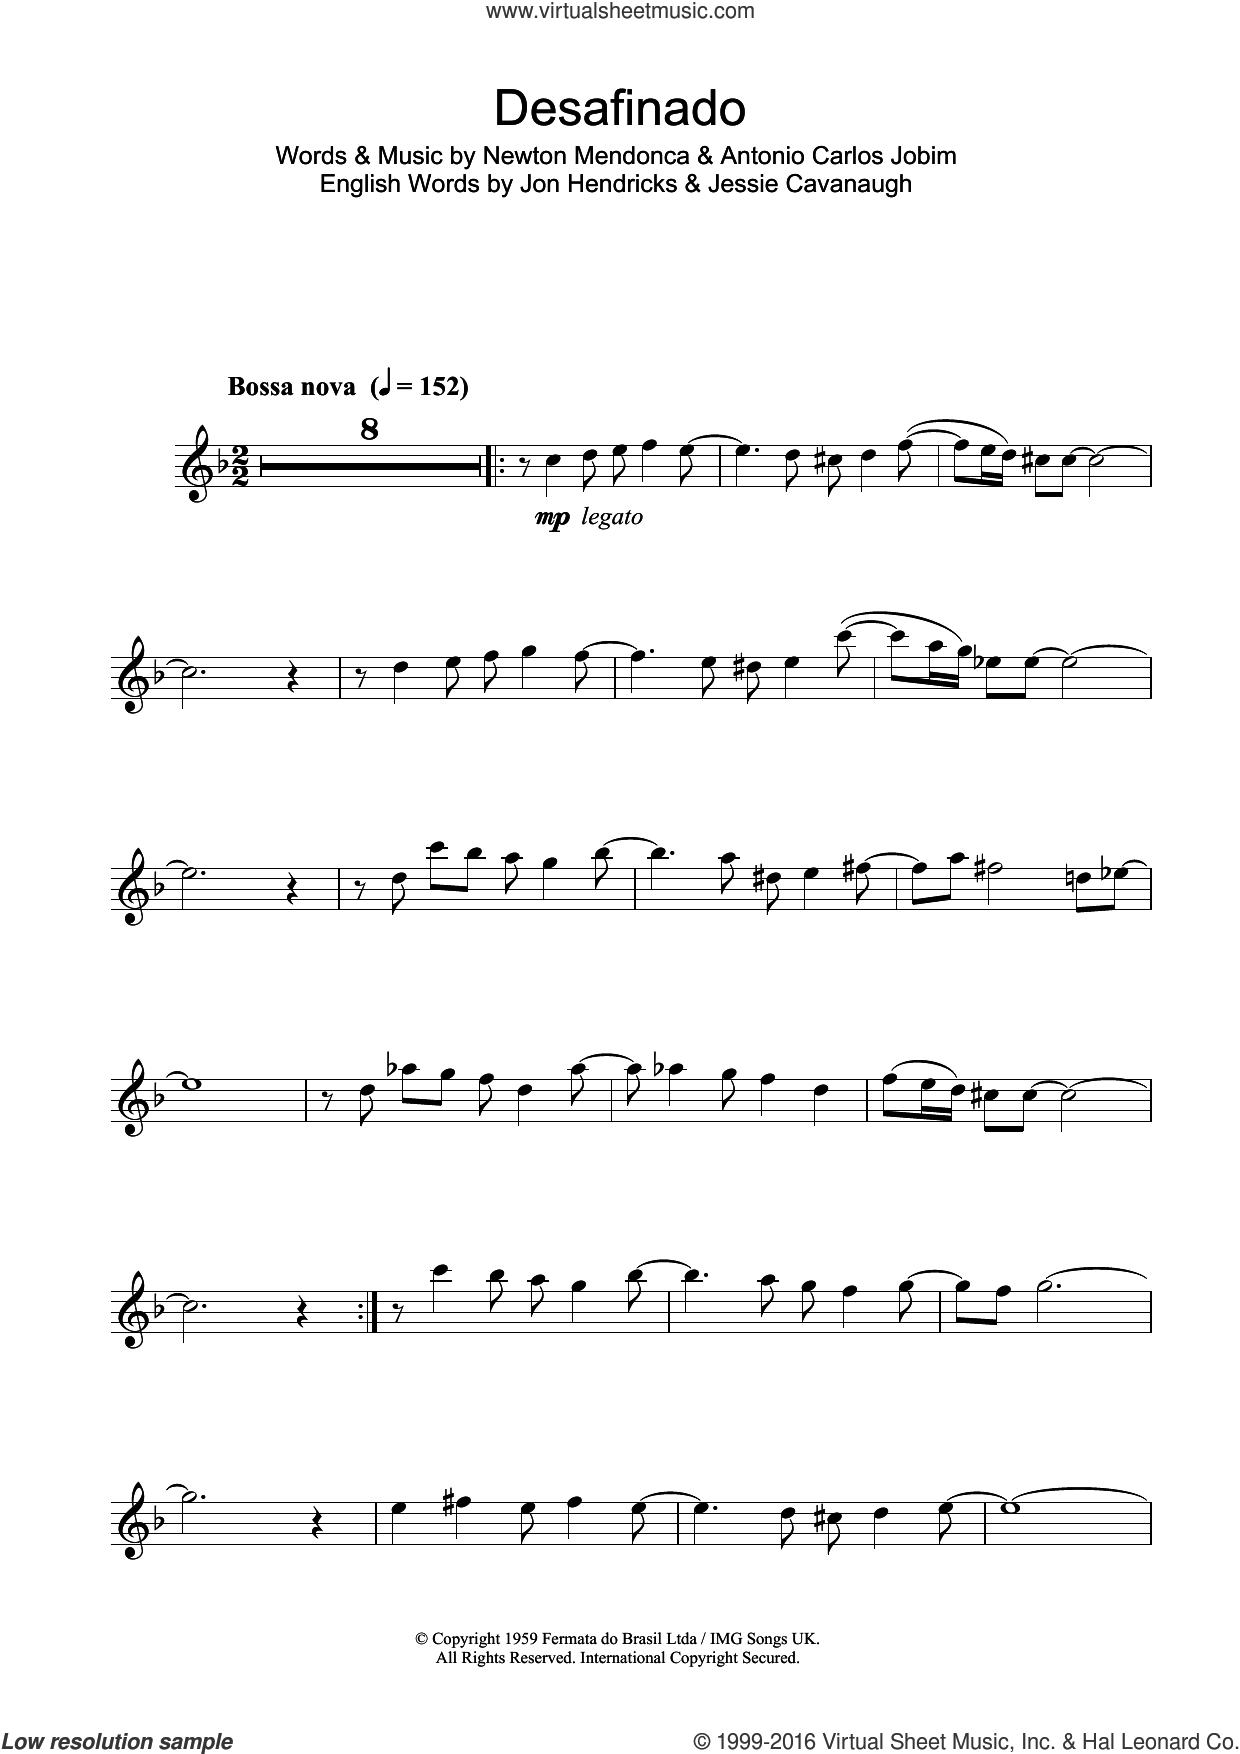 Desafinado (Slightly Out Of Tune) sheet music for tenor saxophone solo by Antonio Carlos Jobim, Jessie Cavanaugh, Jon Hendricks and Newton Mendonca, intermediate skill level